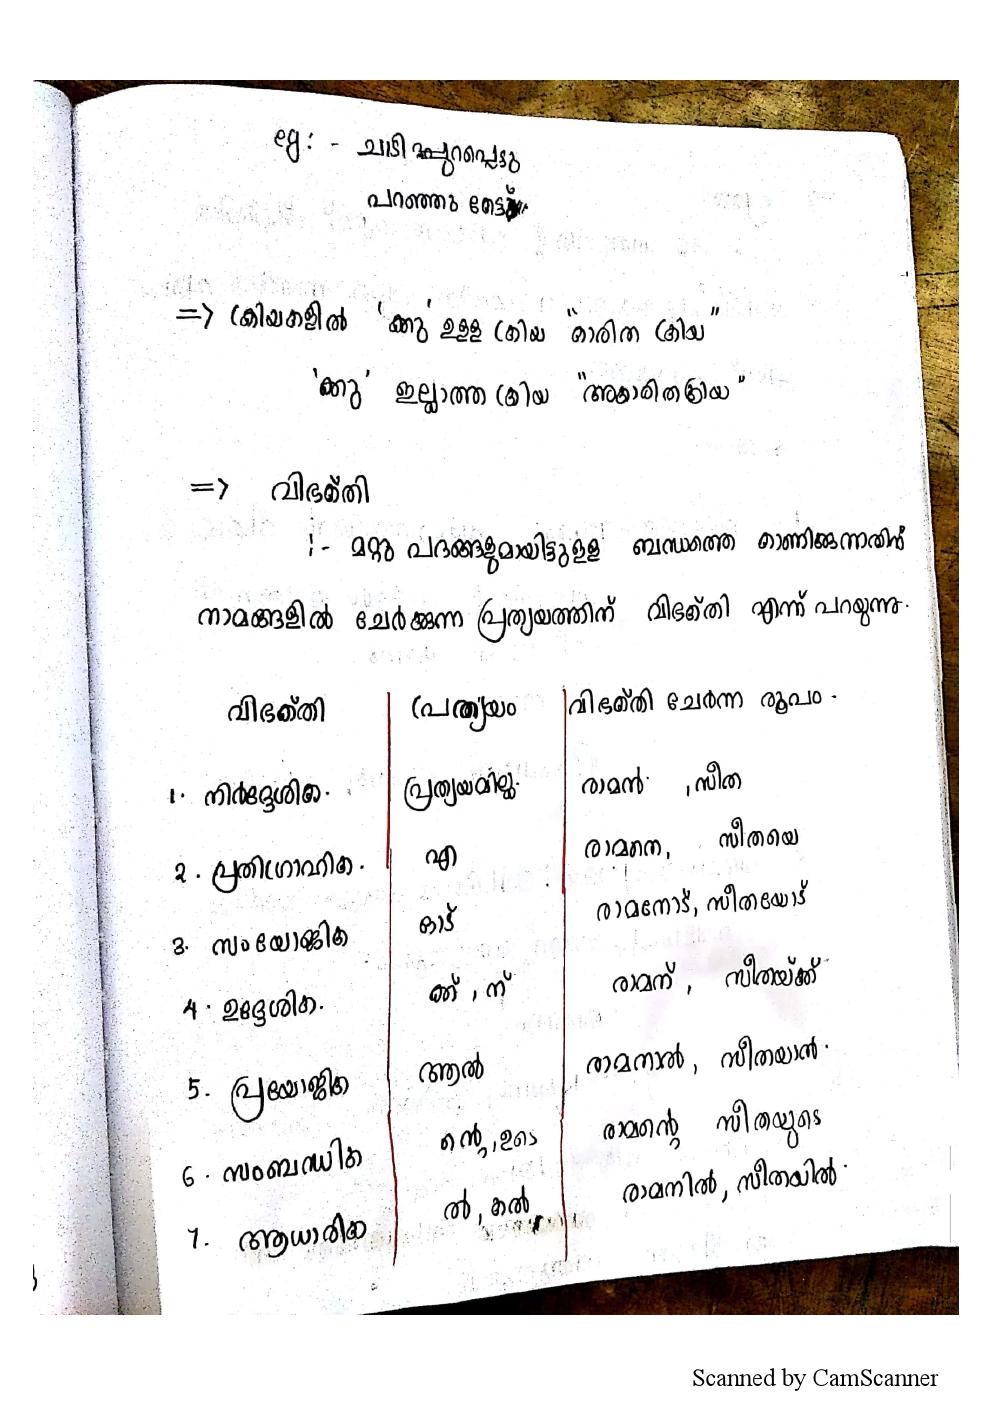 http://masterstudy.net/pdf/ktet_notes0096.png